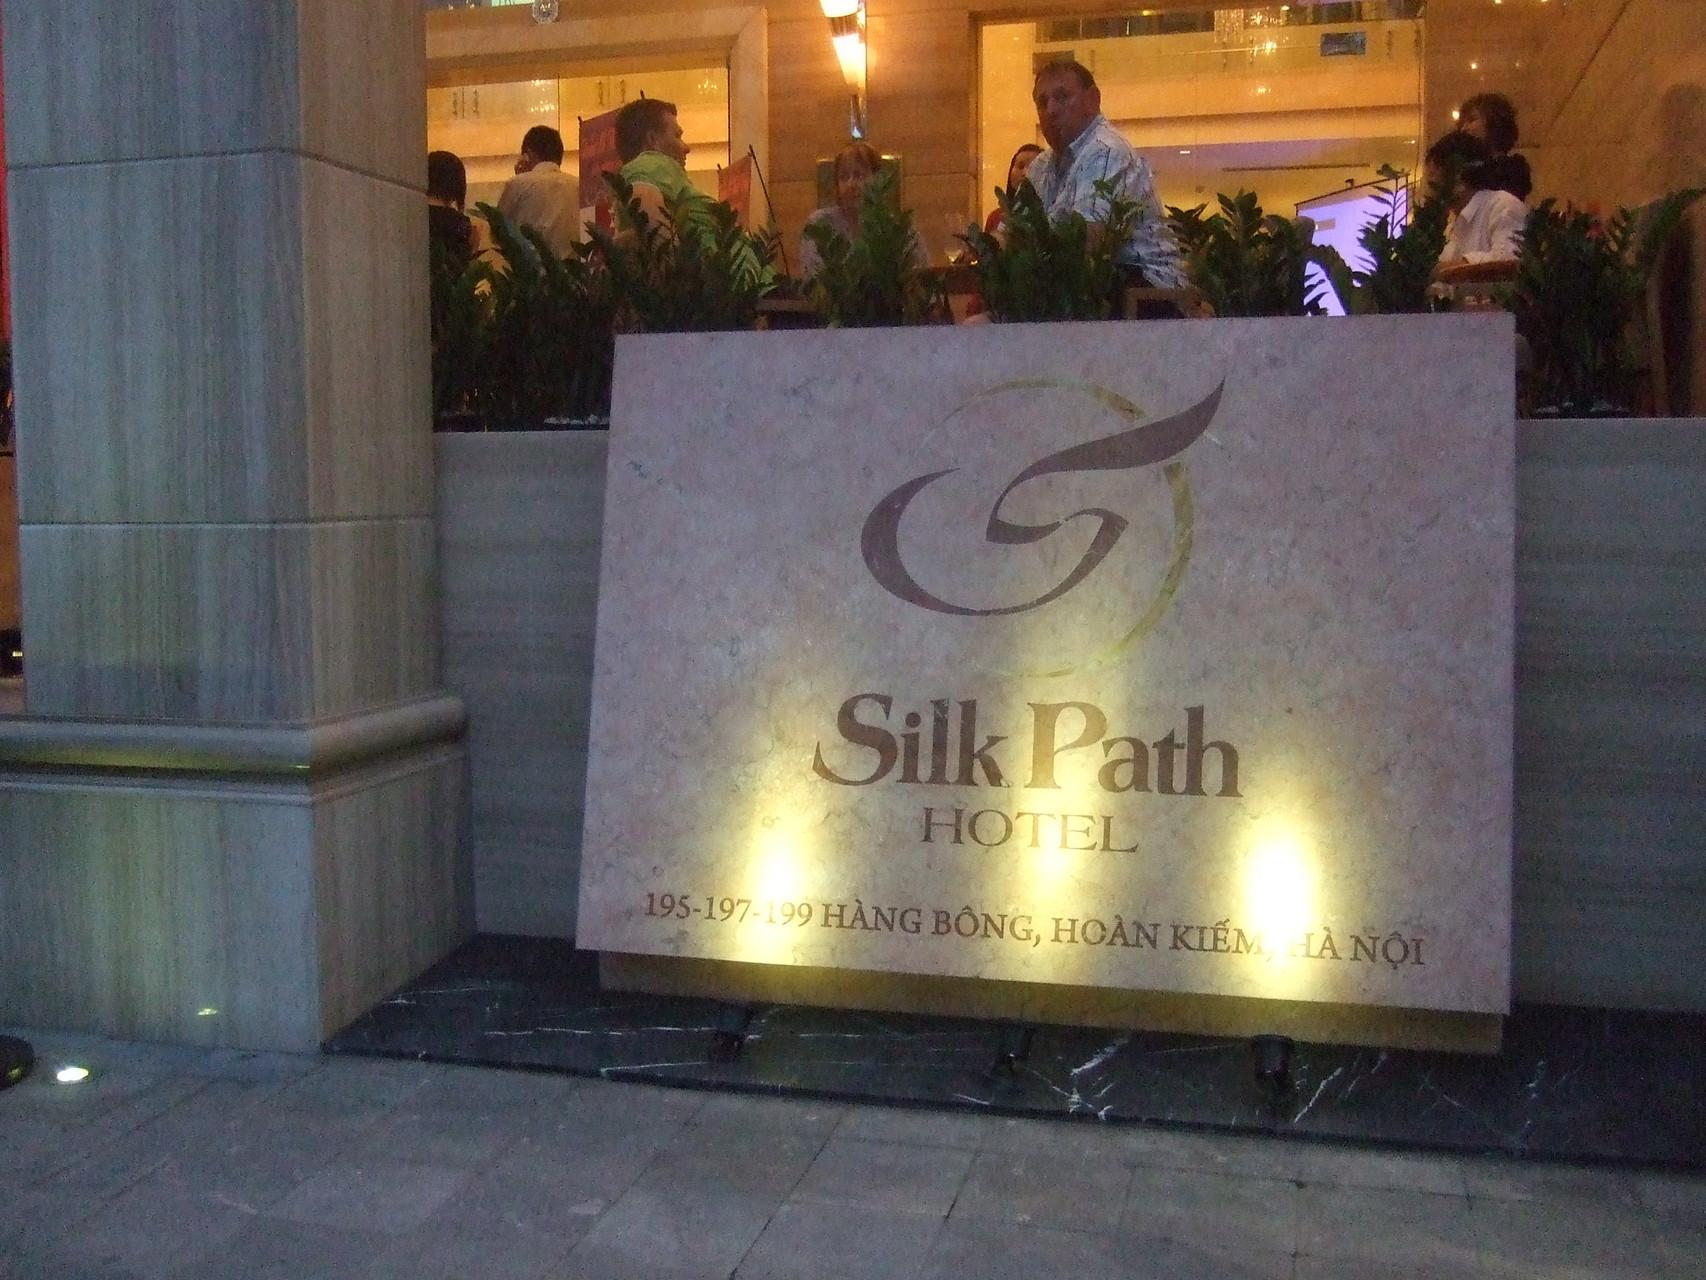 Hotel Silk Path Hanoi